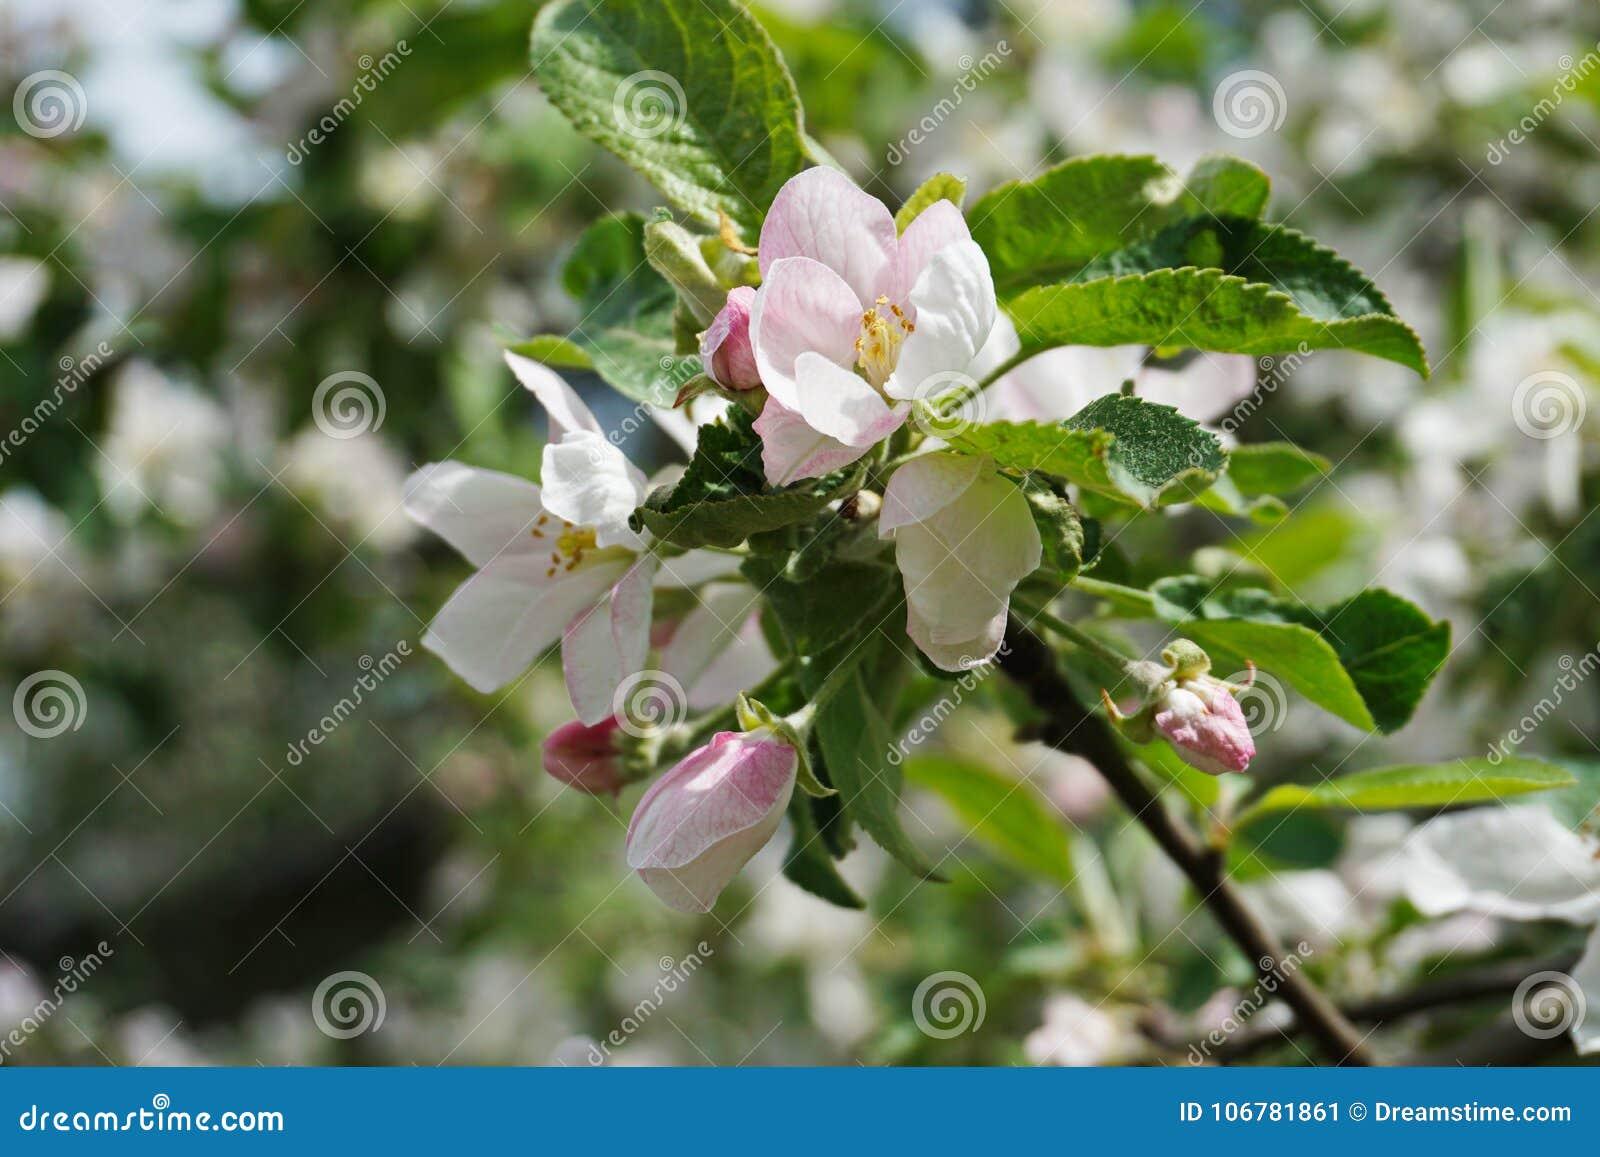 Light Pink Apple Blossom The Gardens Flowering Trees Stock Image